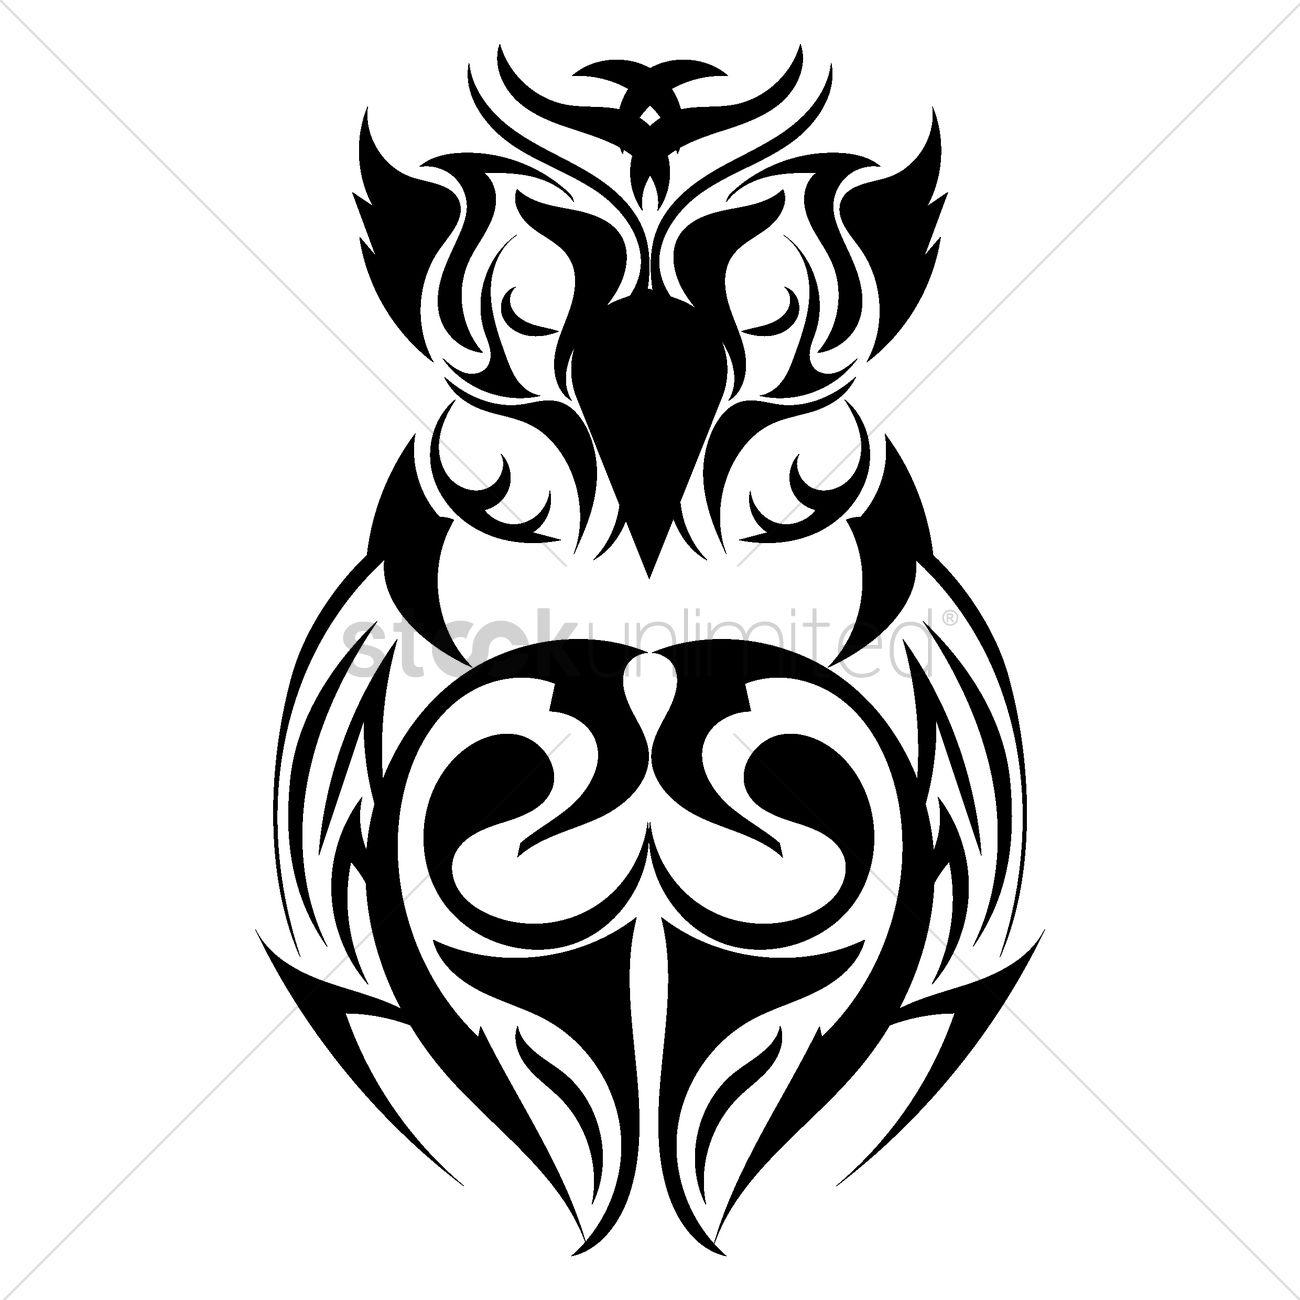 1300x1300 Owl Tattoo Design Vector Image